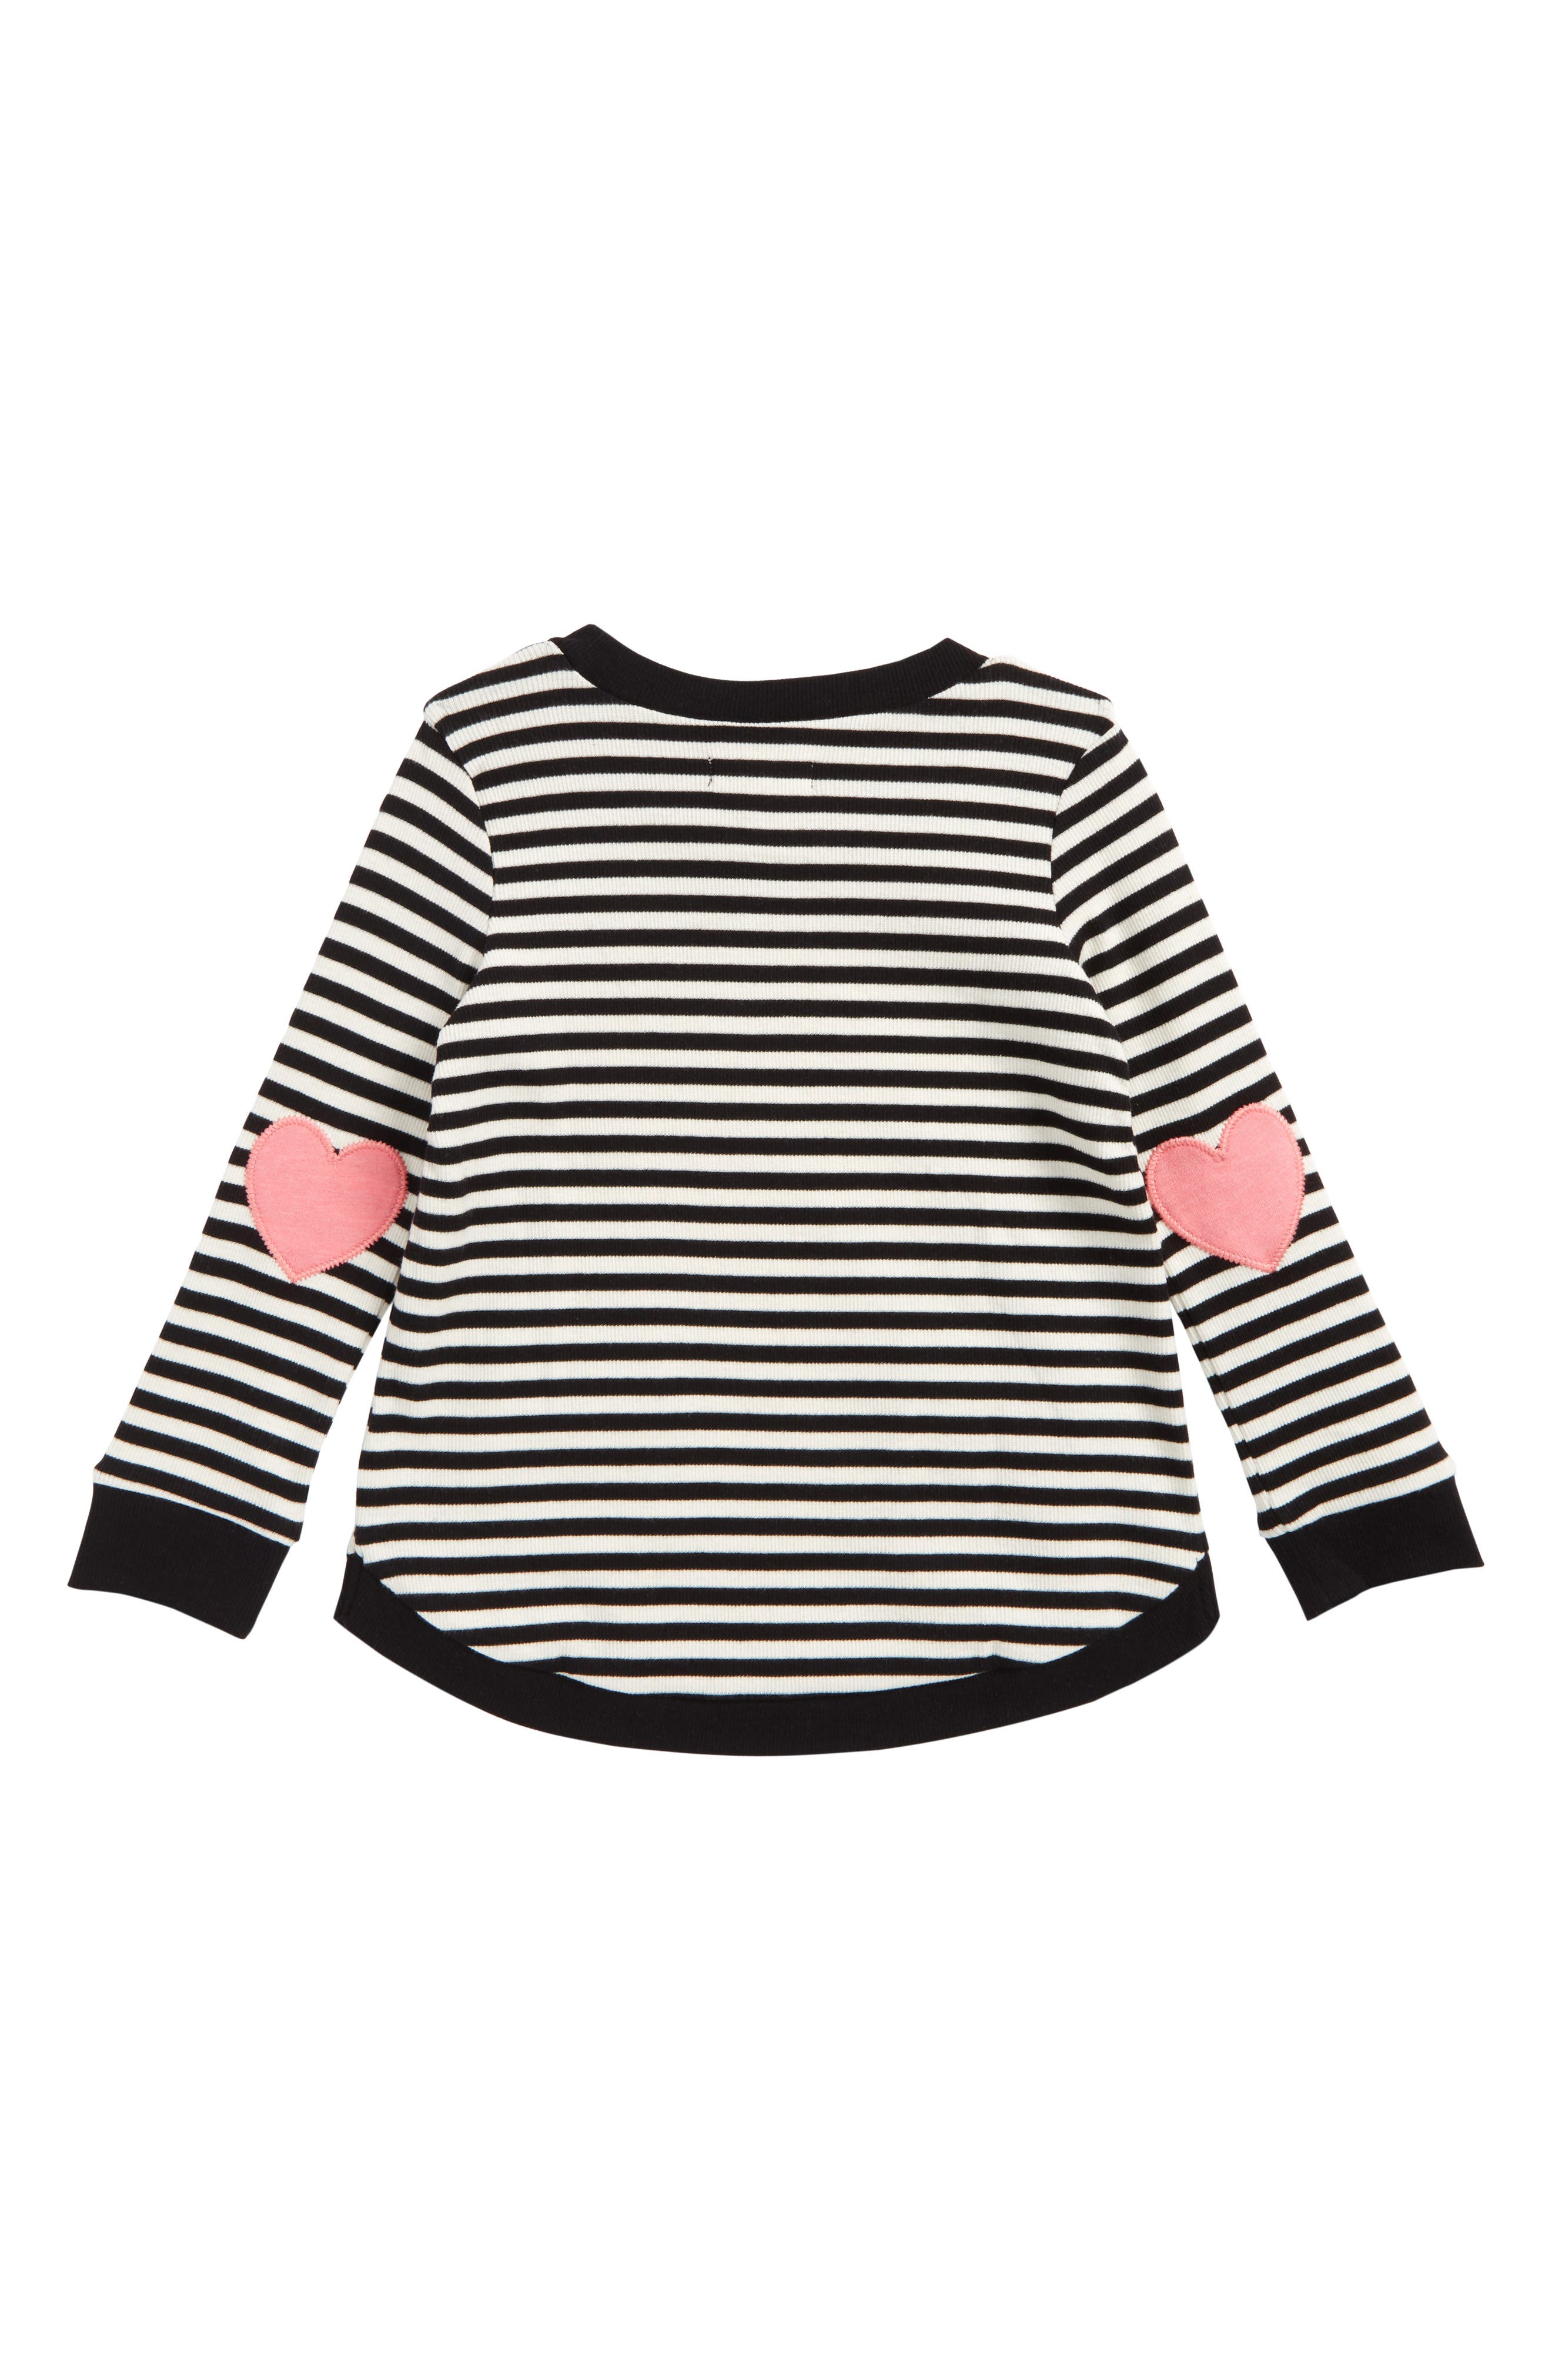 Heart Elbow Patch Stripe Tunic Top,                             Alternate thumbnail 2, color,                             Black Rock- Ivory Stripe